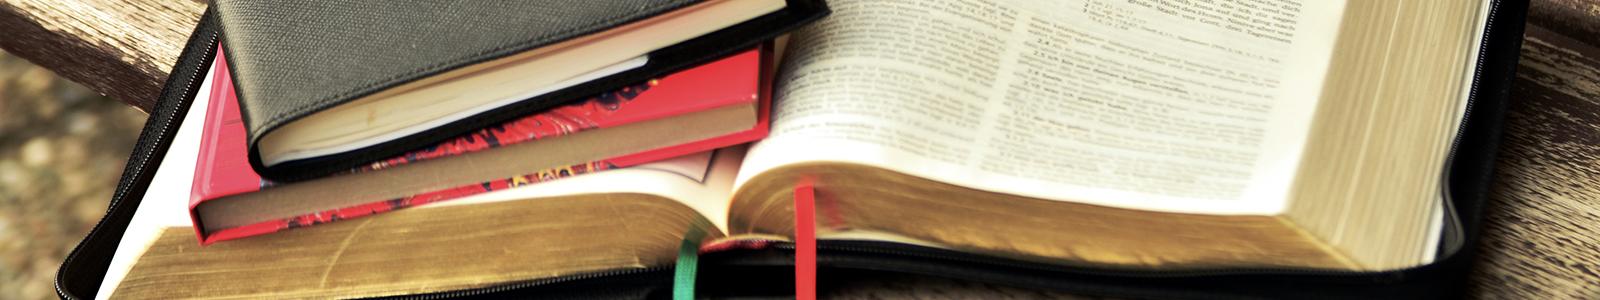 Bibel lesen